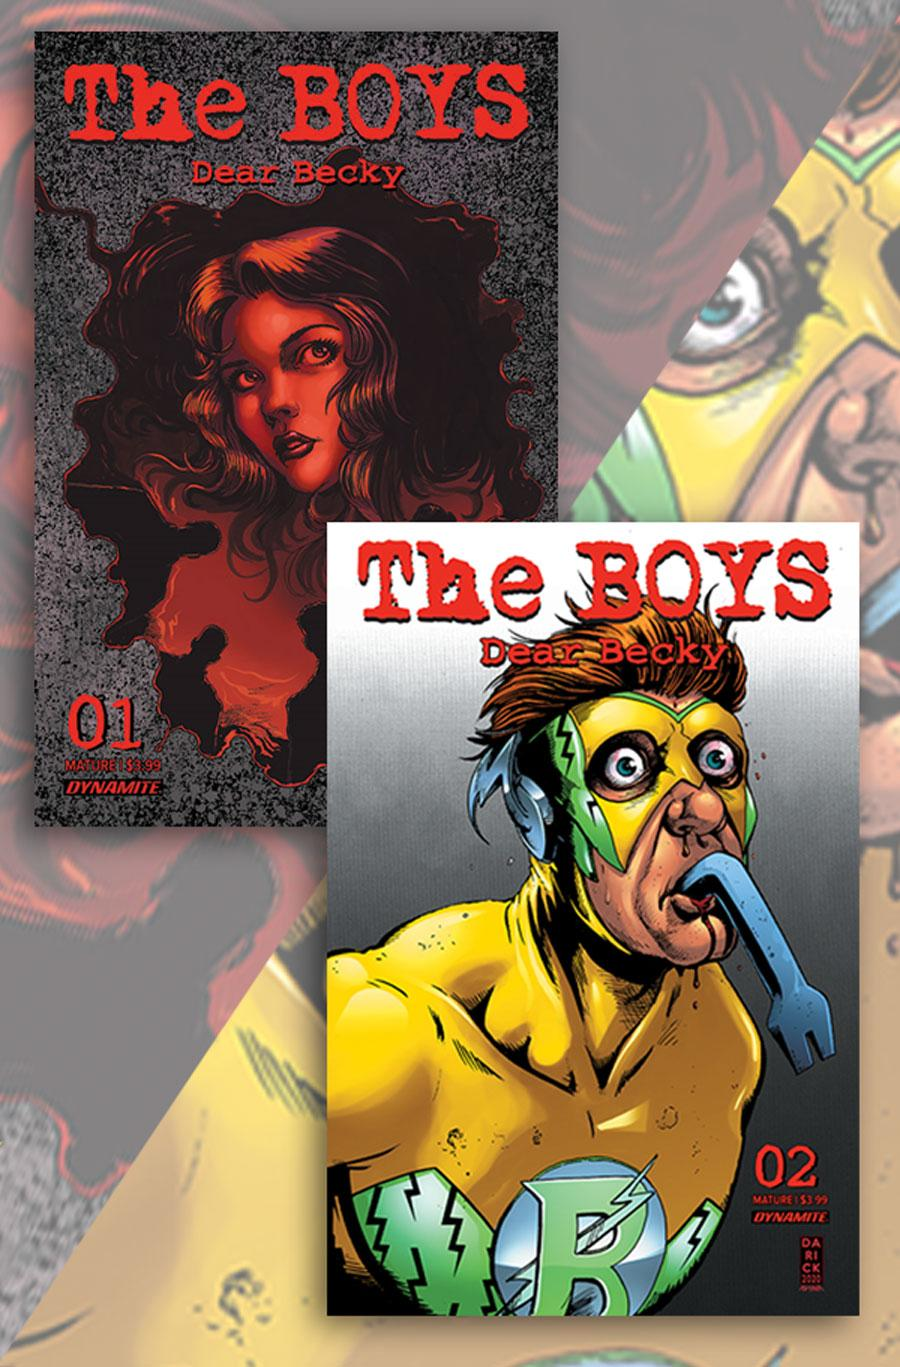 Boys Dear Becky #1 / 2 Combo Pack